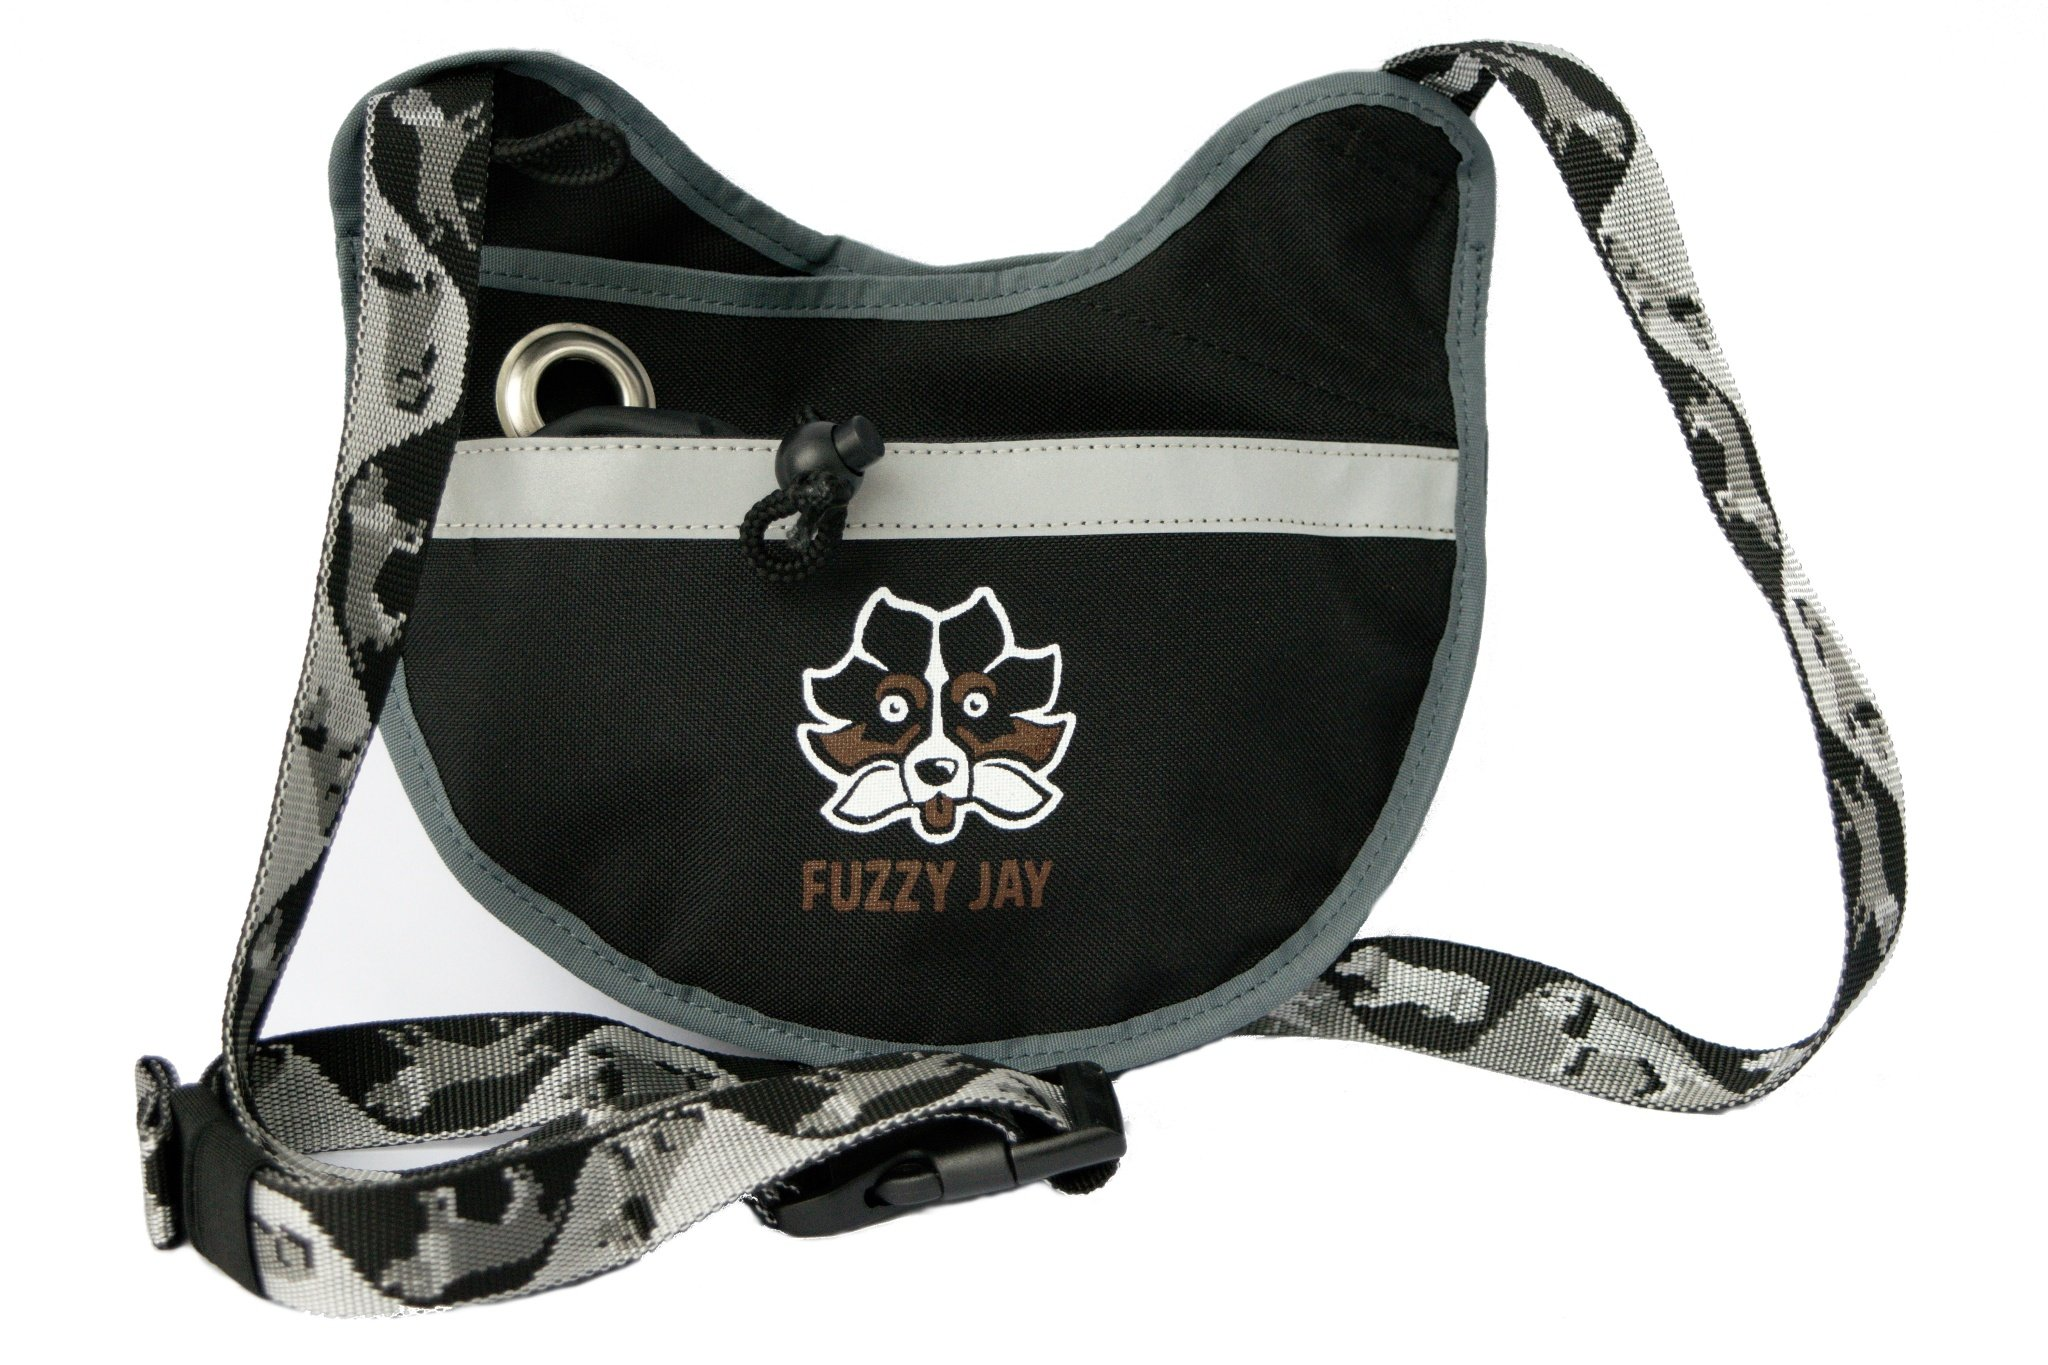 FUZZY JAY Agility Training Bag - Dog Treat Pouch (Black/Grey)